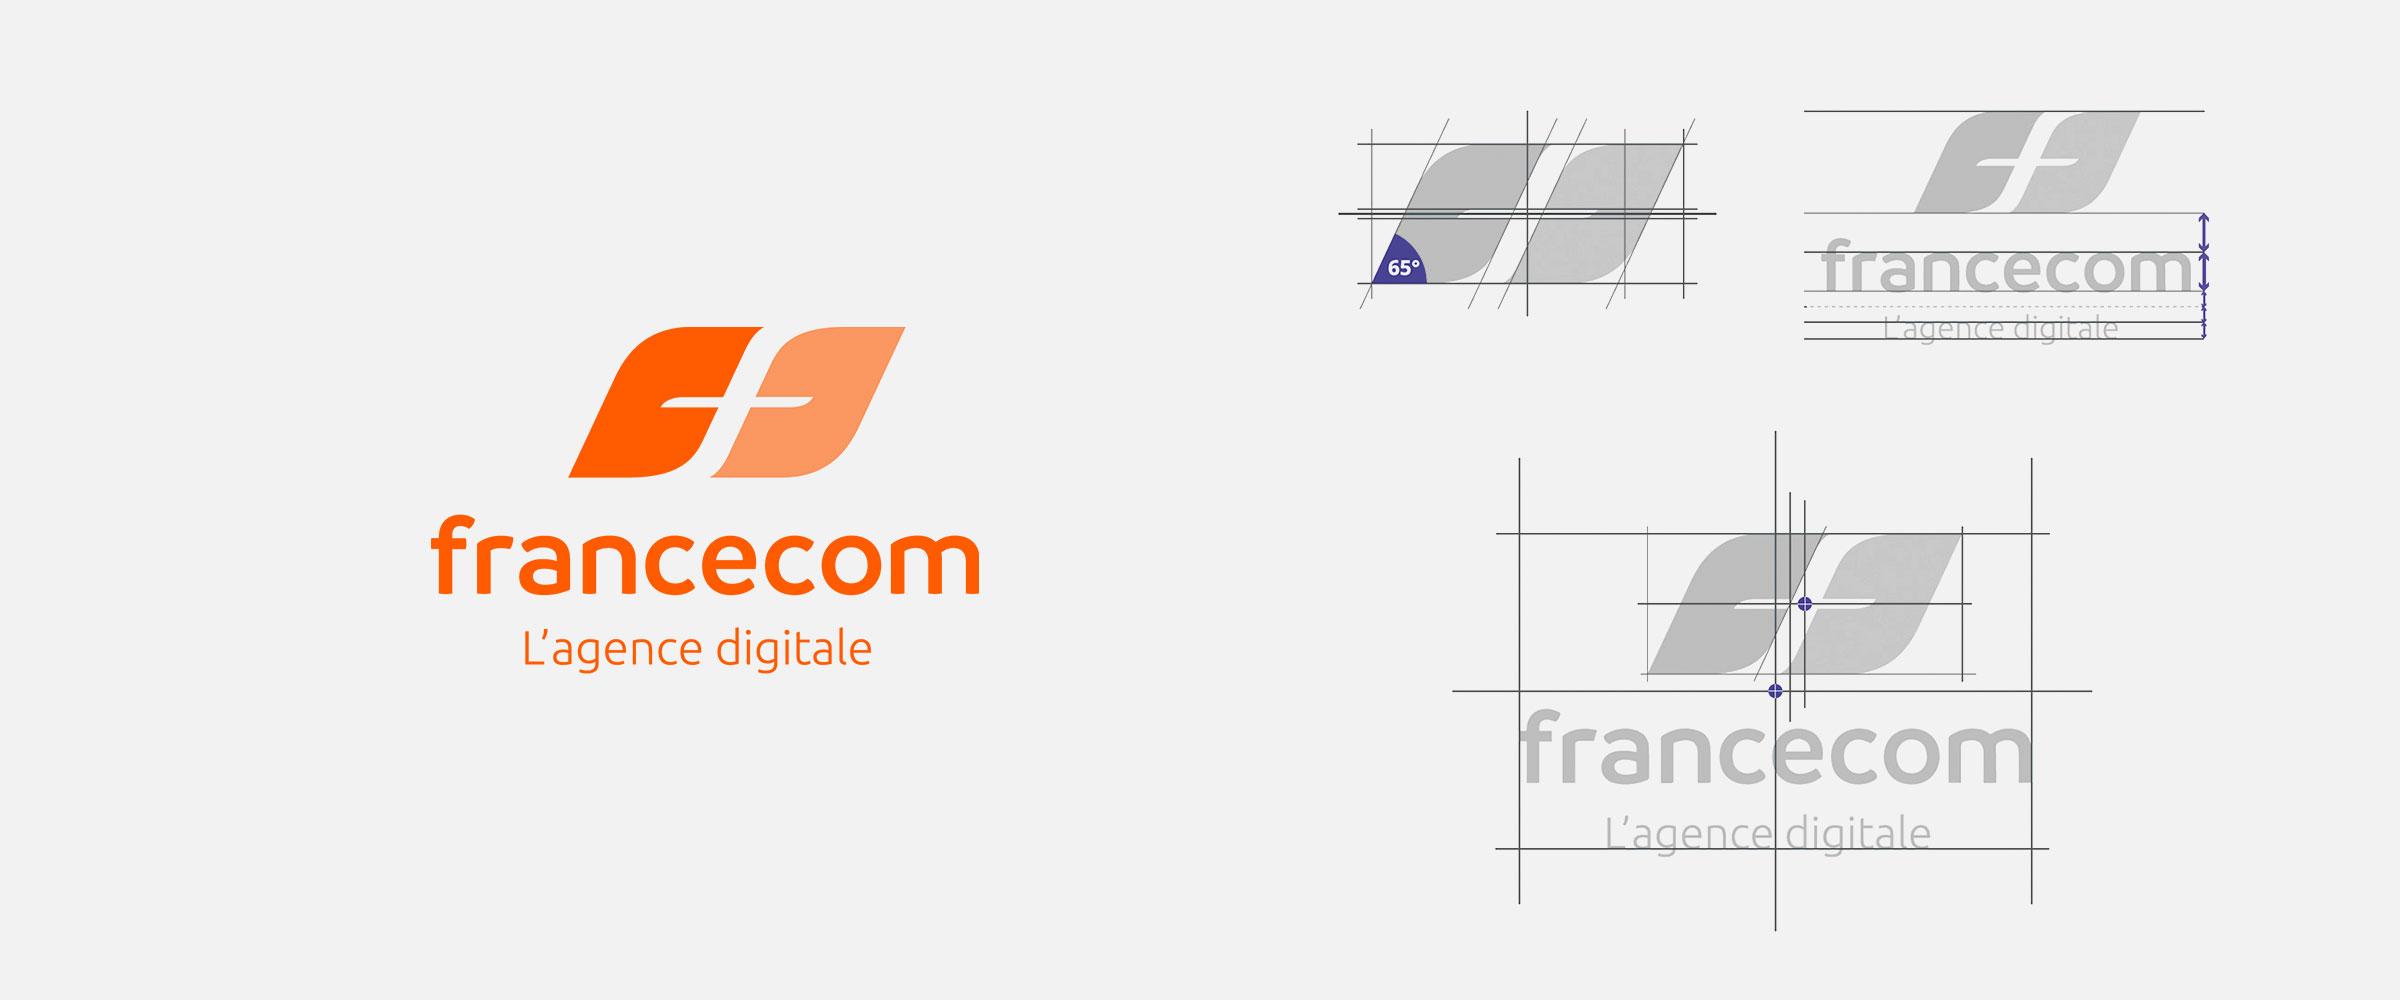 francecom construction logo